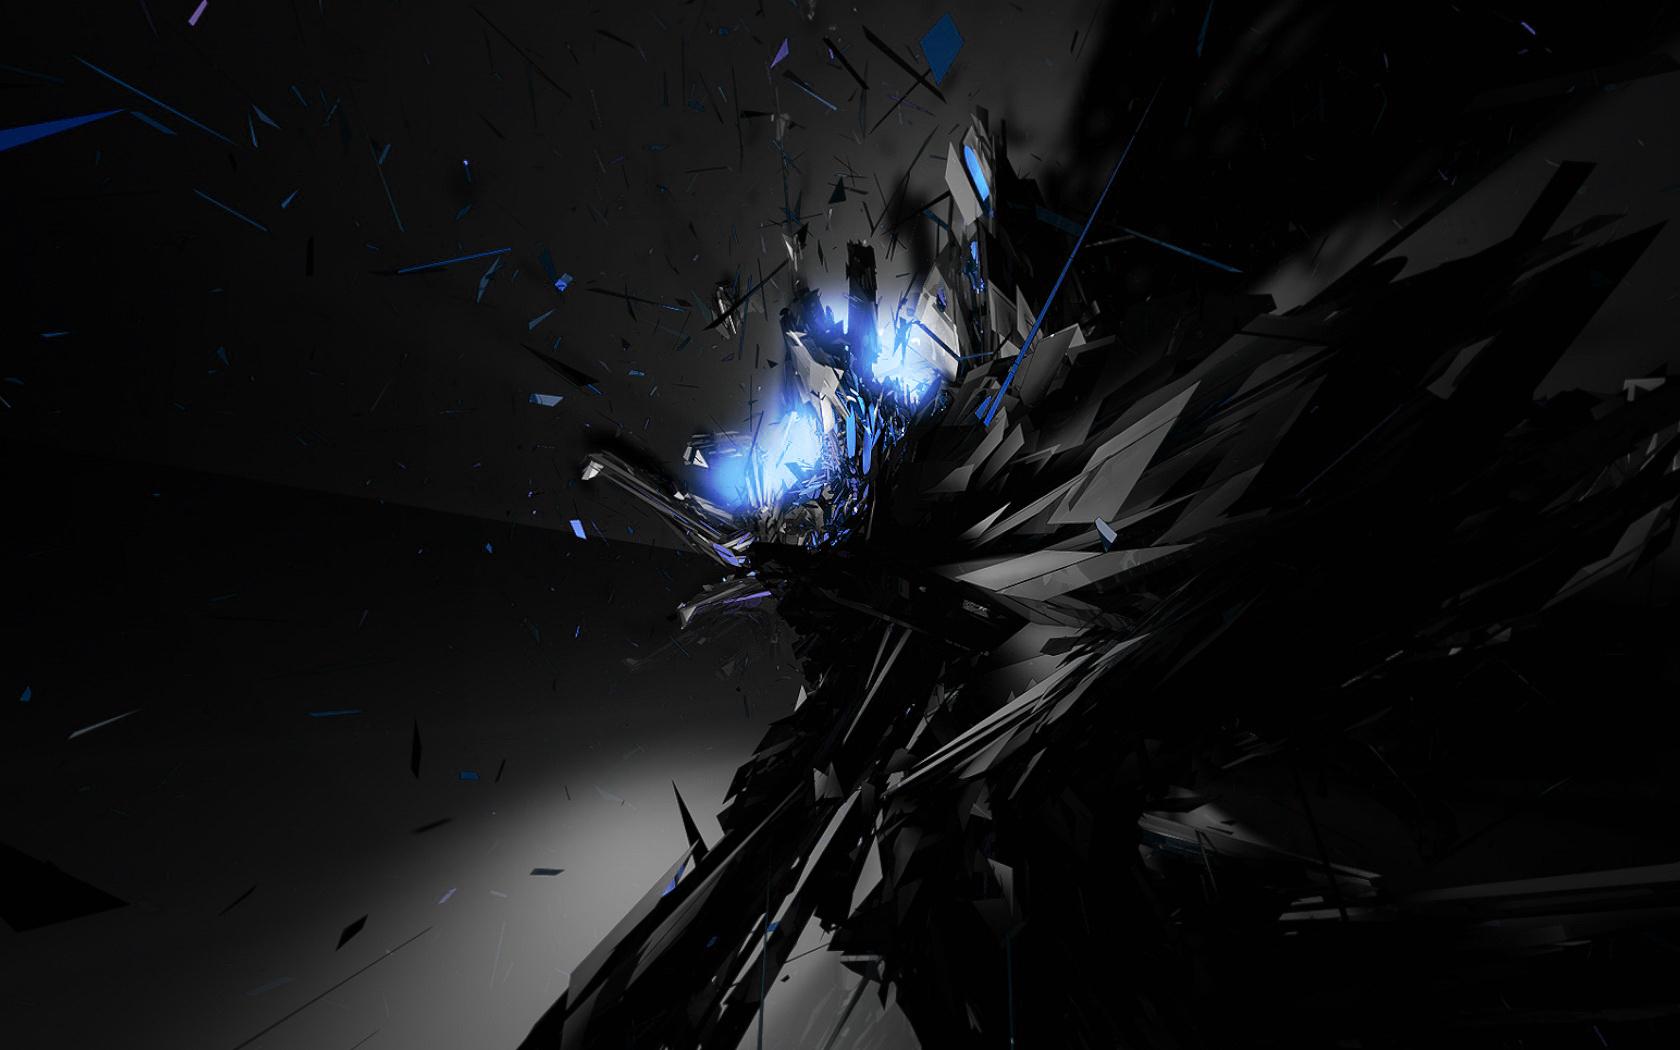 Abstract By Black Dragon 1680x1050 pixel Popular HD Wallpaper 23272 1680x1050